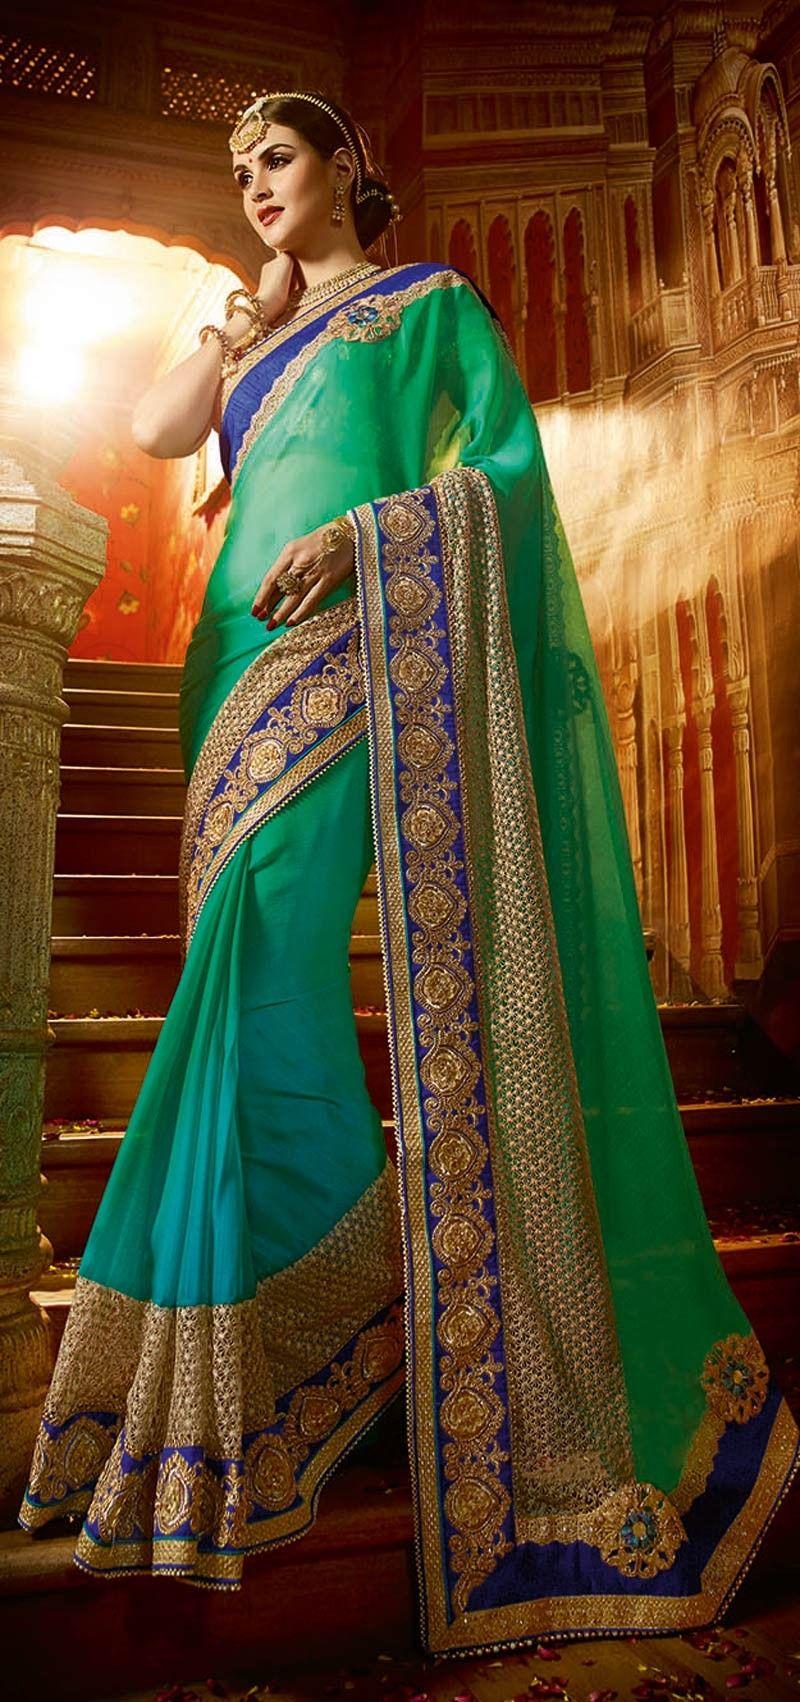 ae7b132e03 Exclusive Green Party Wear Georgette Chiffon Designer Saree with heavy lace  border